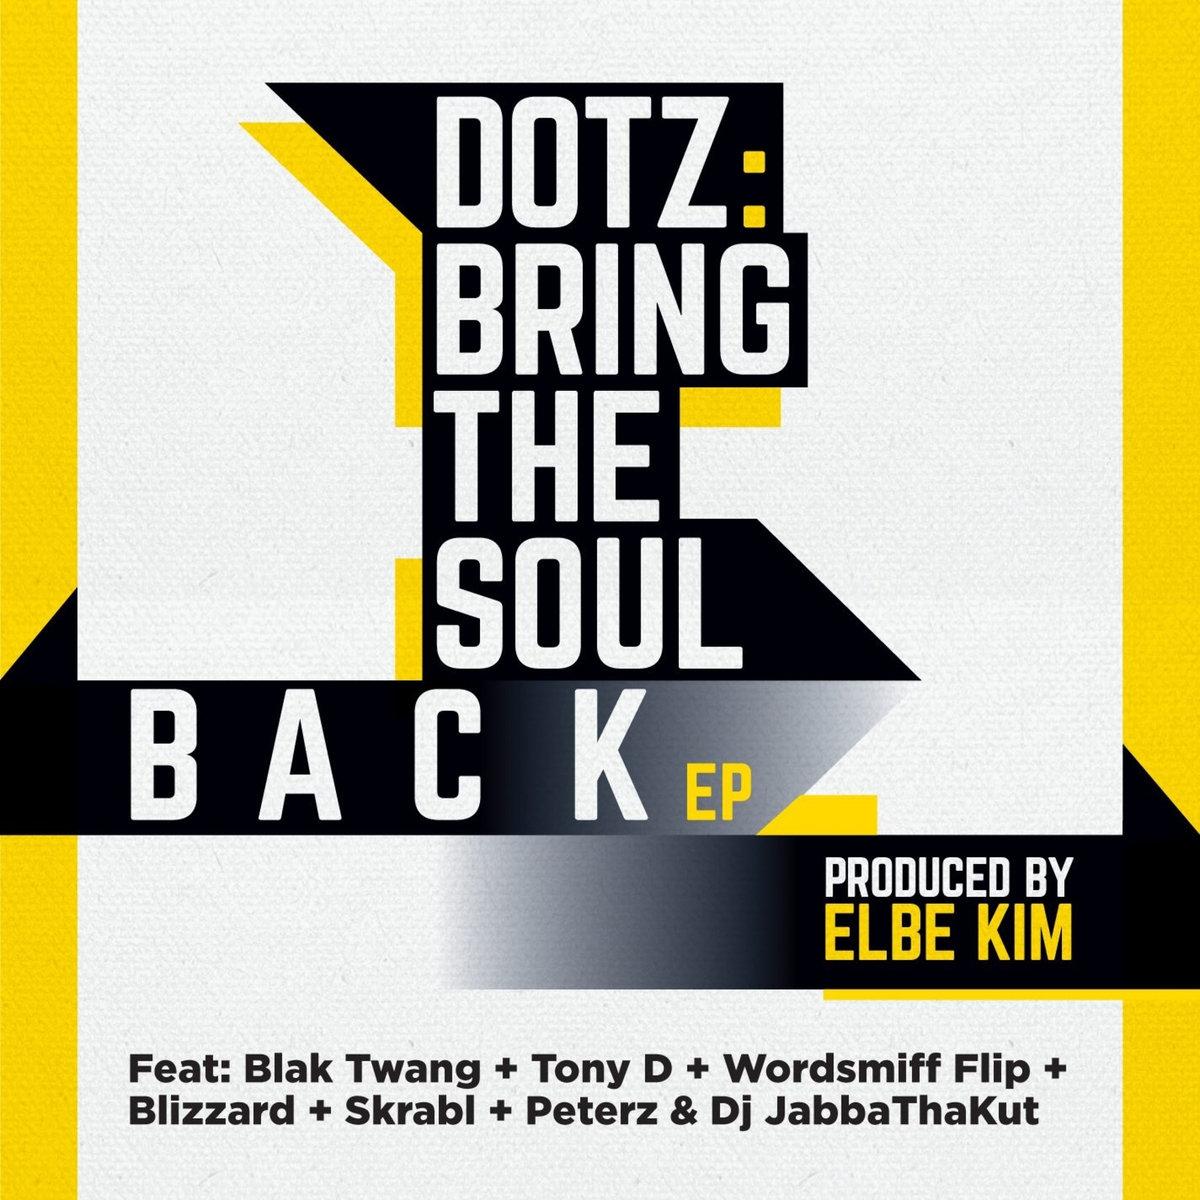 Stream_dotz_presenta_bring_the_soul_back